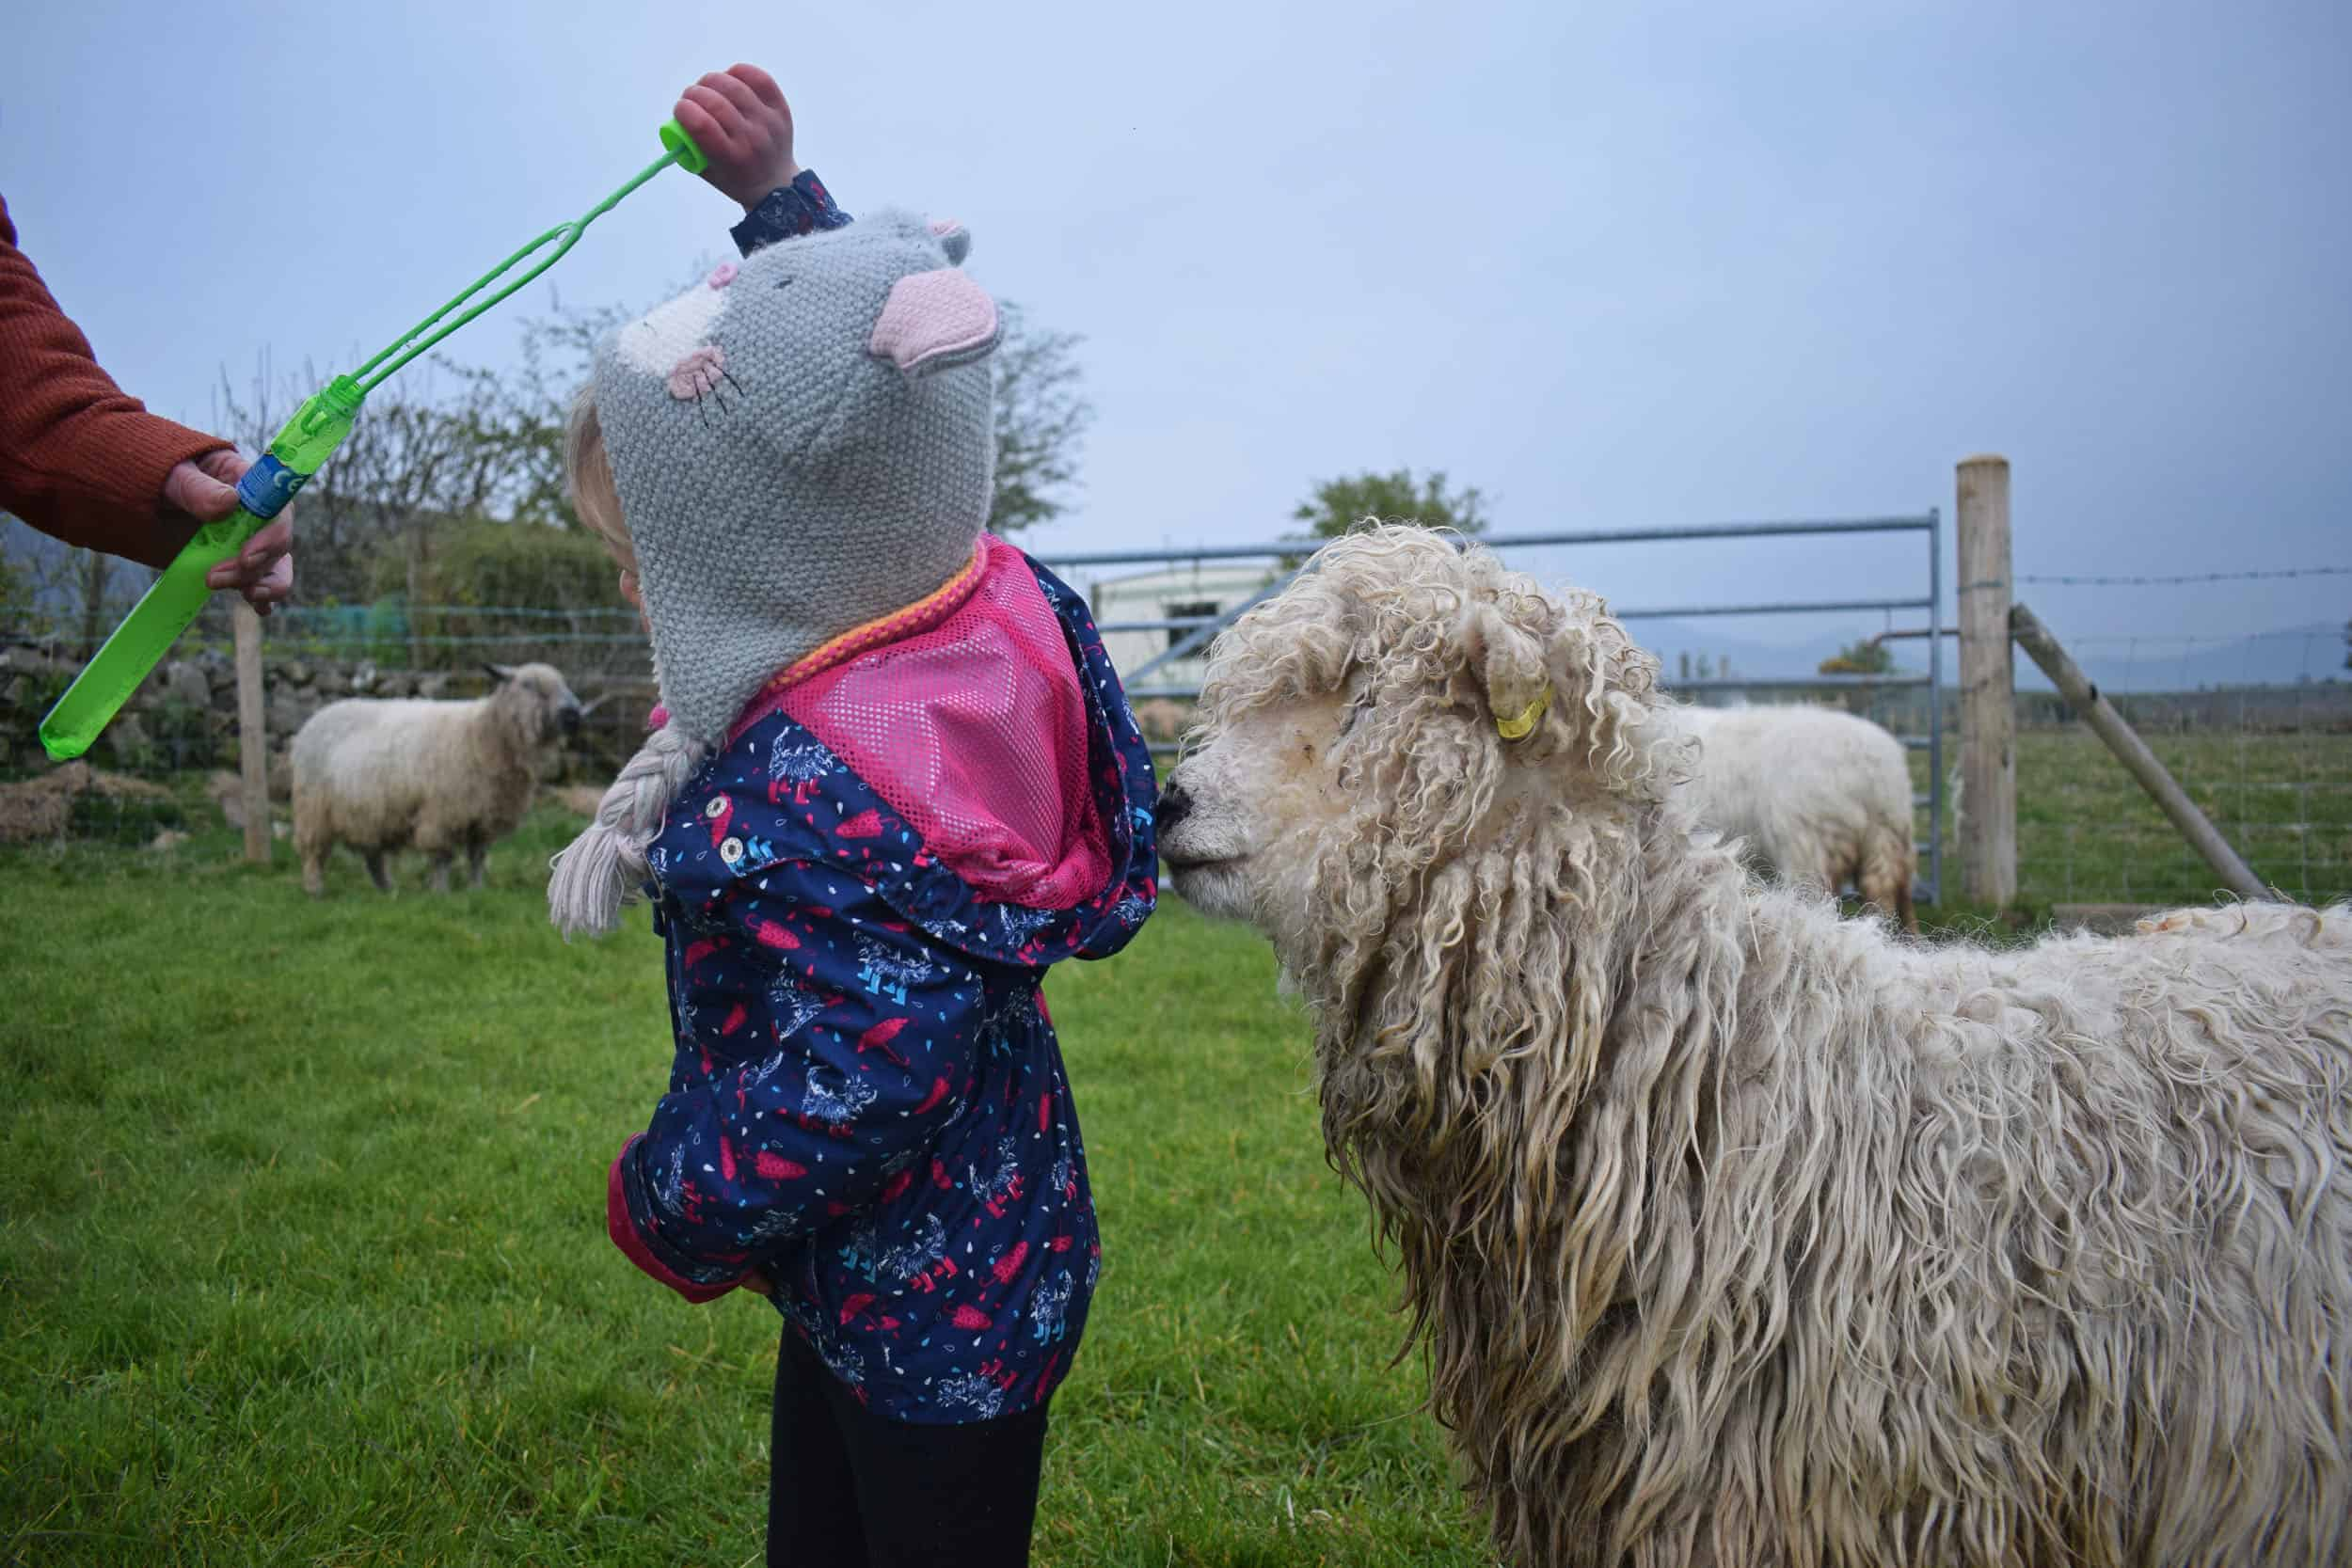 Merry gfd greyface dartmoor cute sheep vegetarian sheepskin rugs fleece grey face bubbles